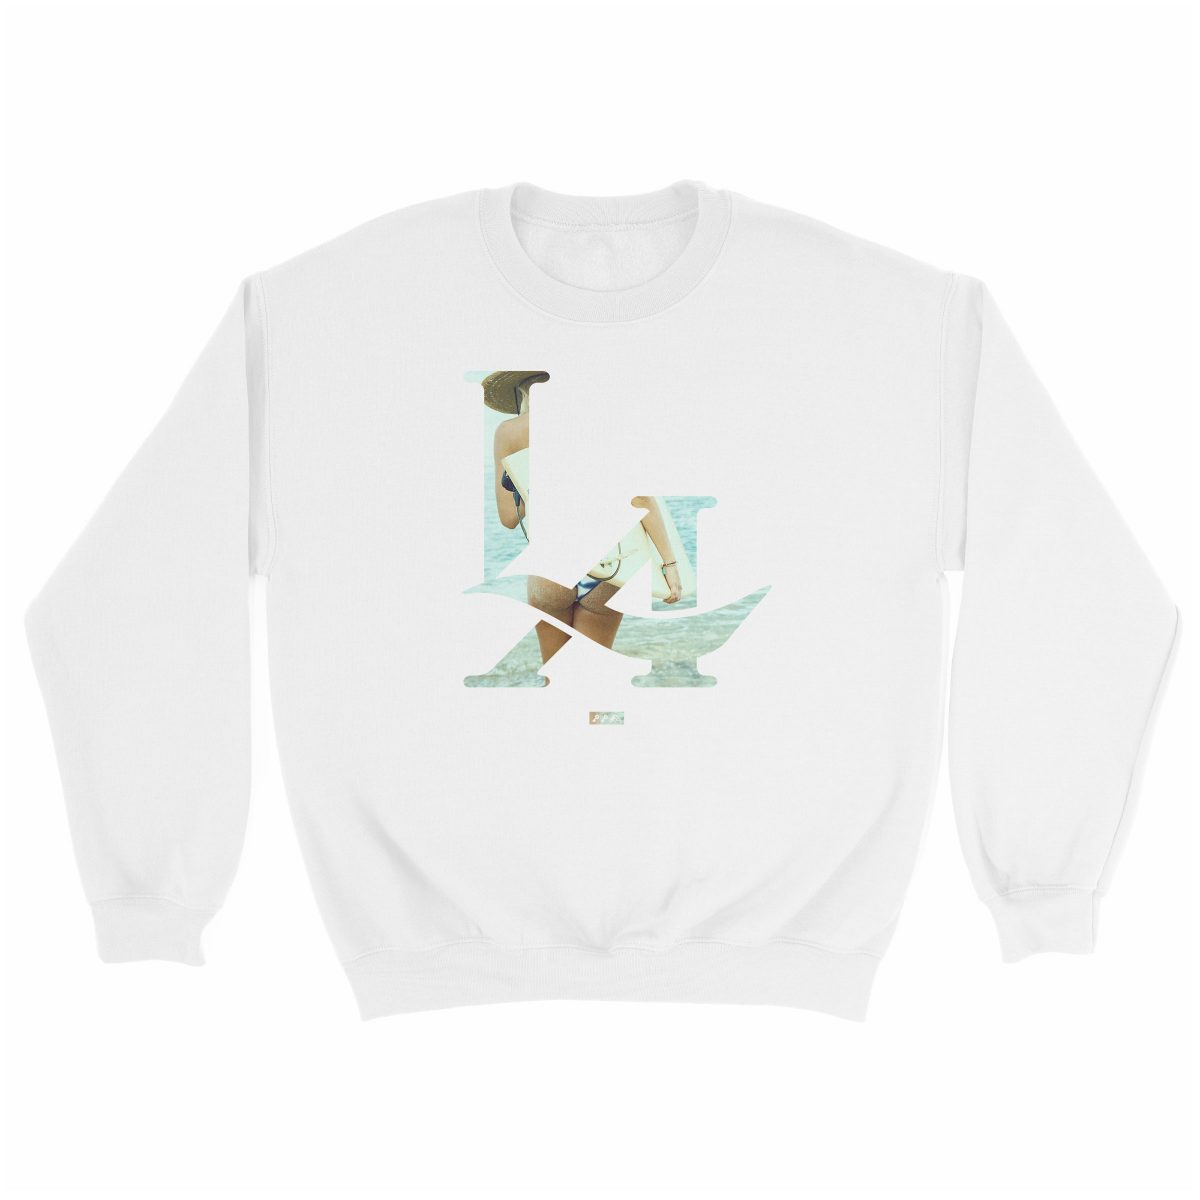 LA logo los angeles surfs up bikini ass beach sweatshirt in white at kikicutt.com